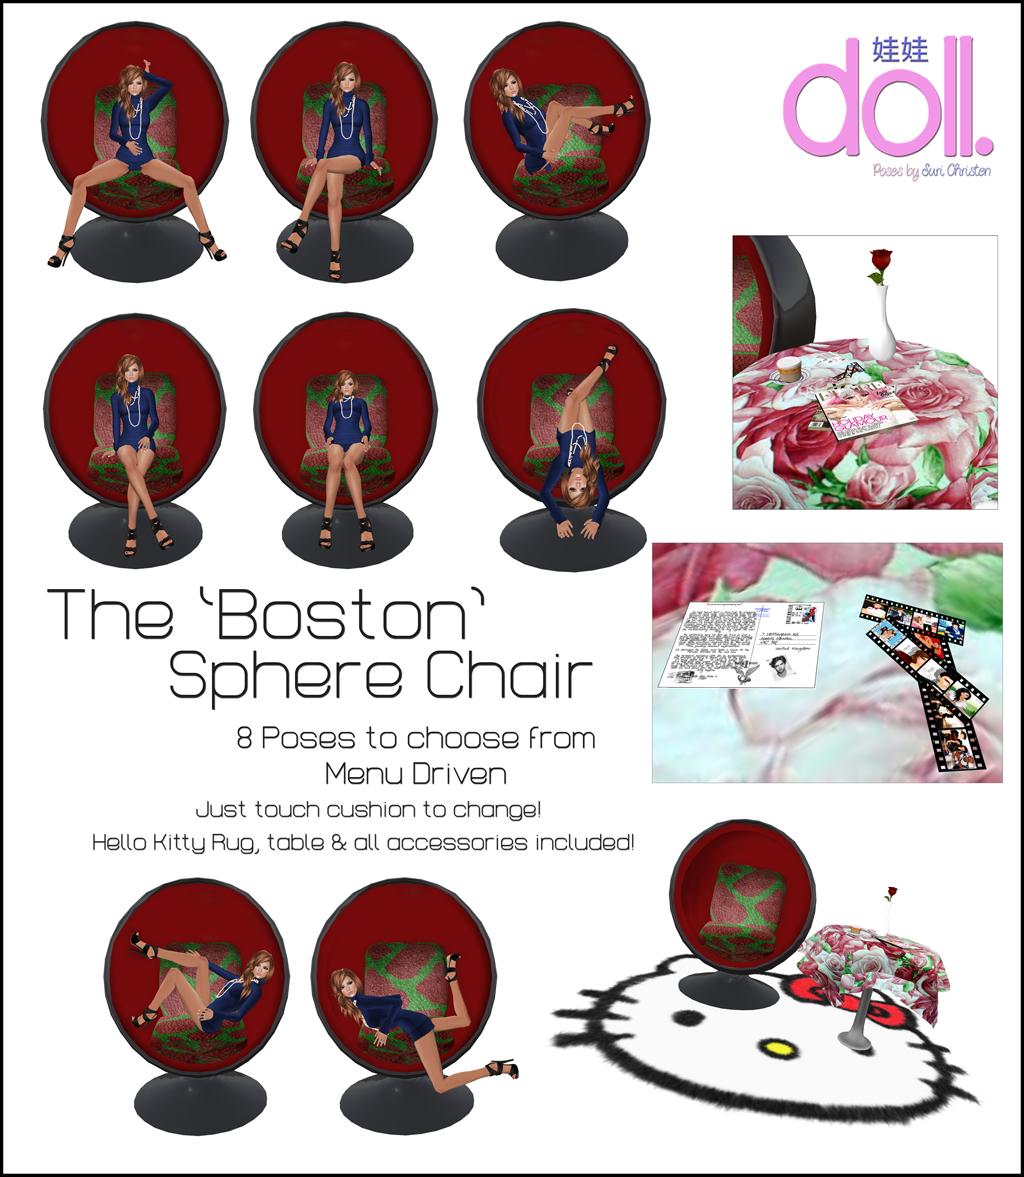 [doll.] The Boston Sphere Chair